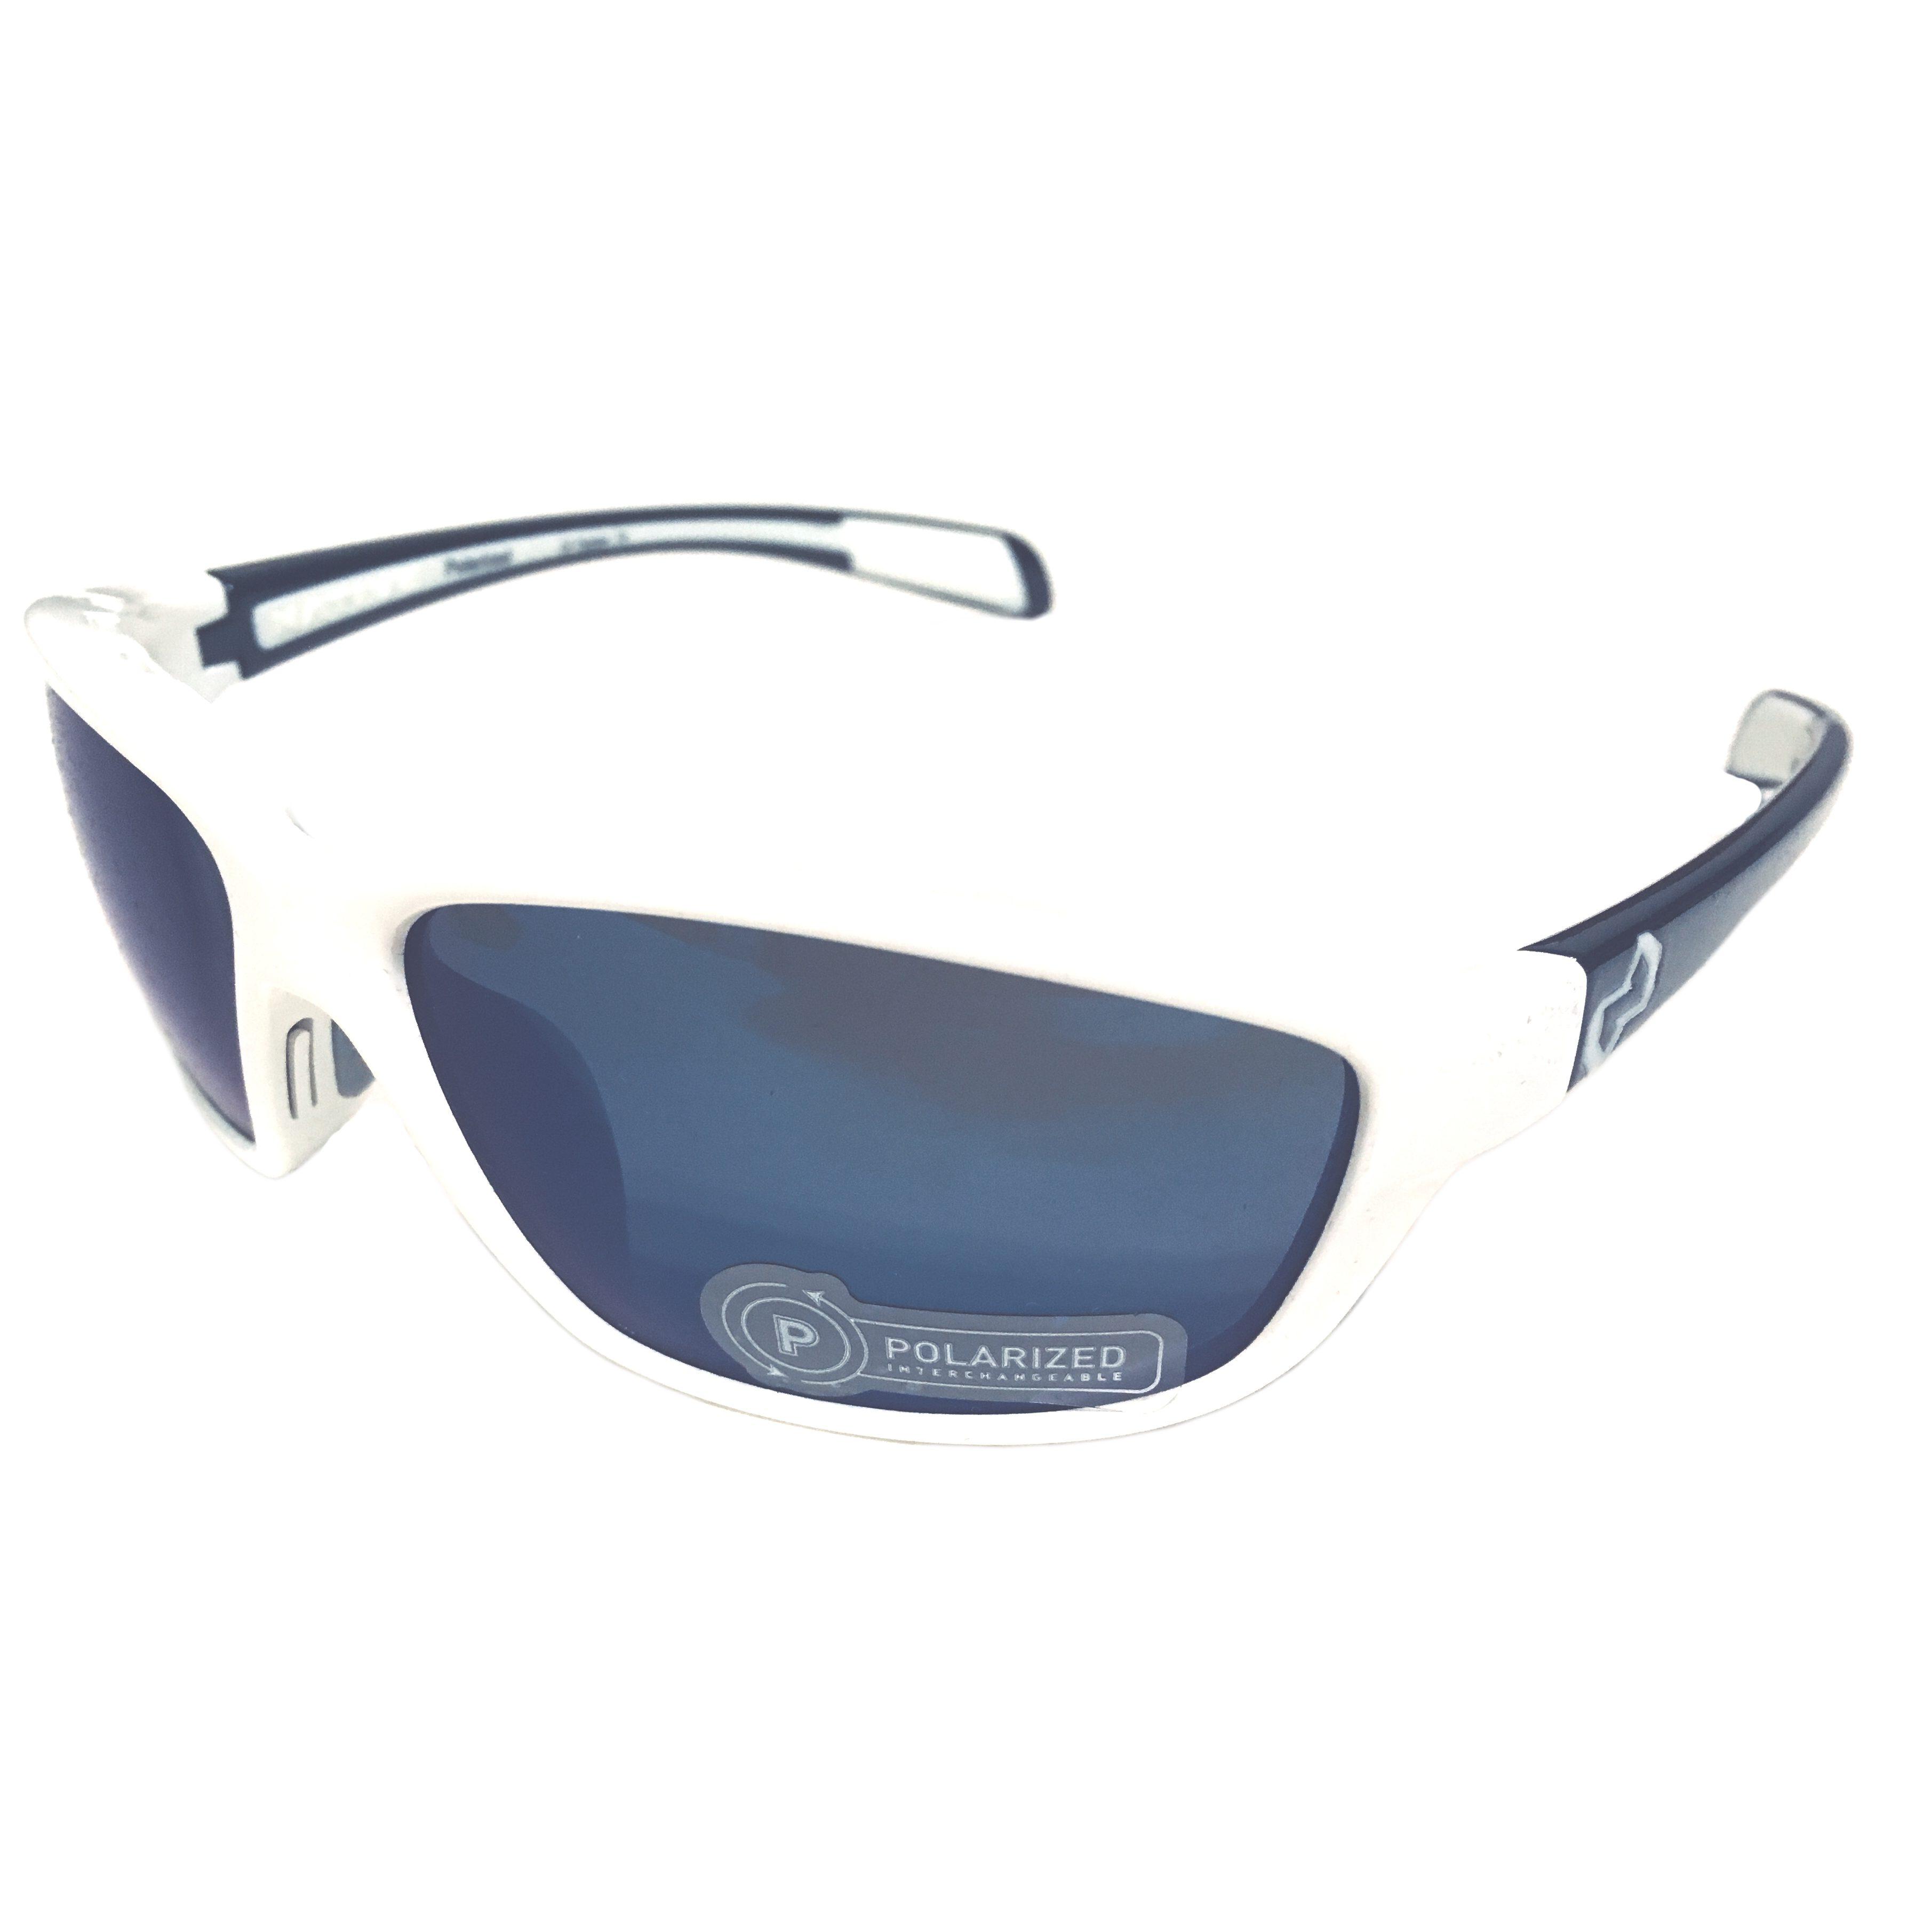 Native Eyewear Kodiak Sunglasses - Snow White Gloss Black POLARIZED Blue Reflex N3